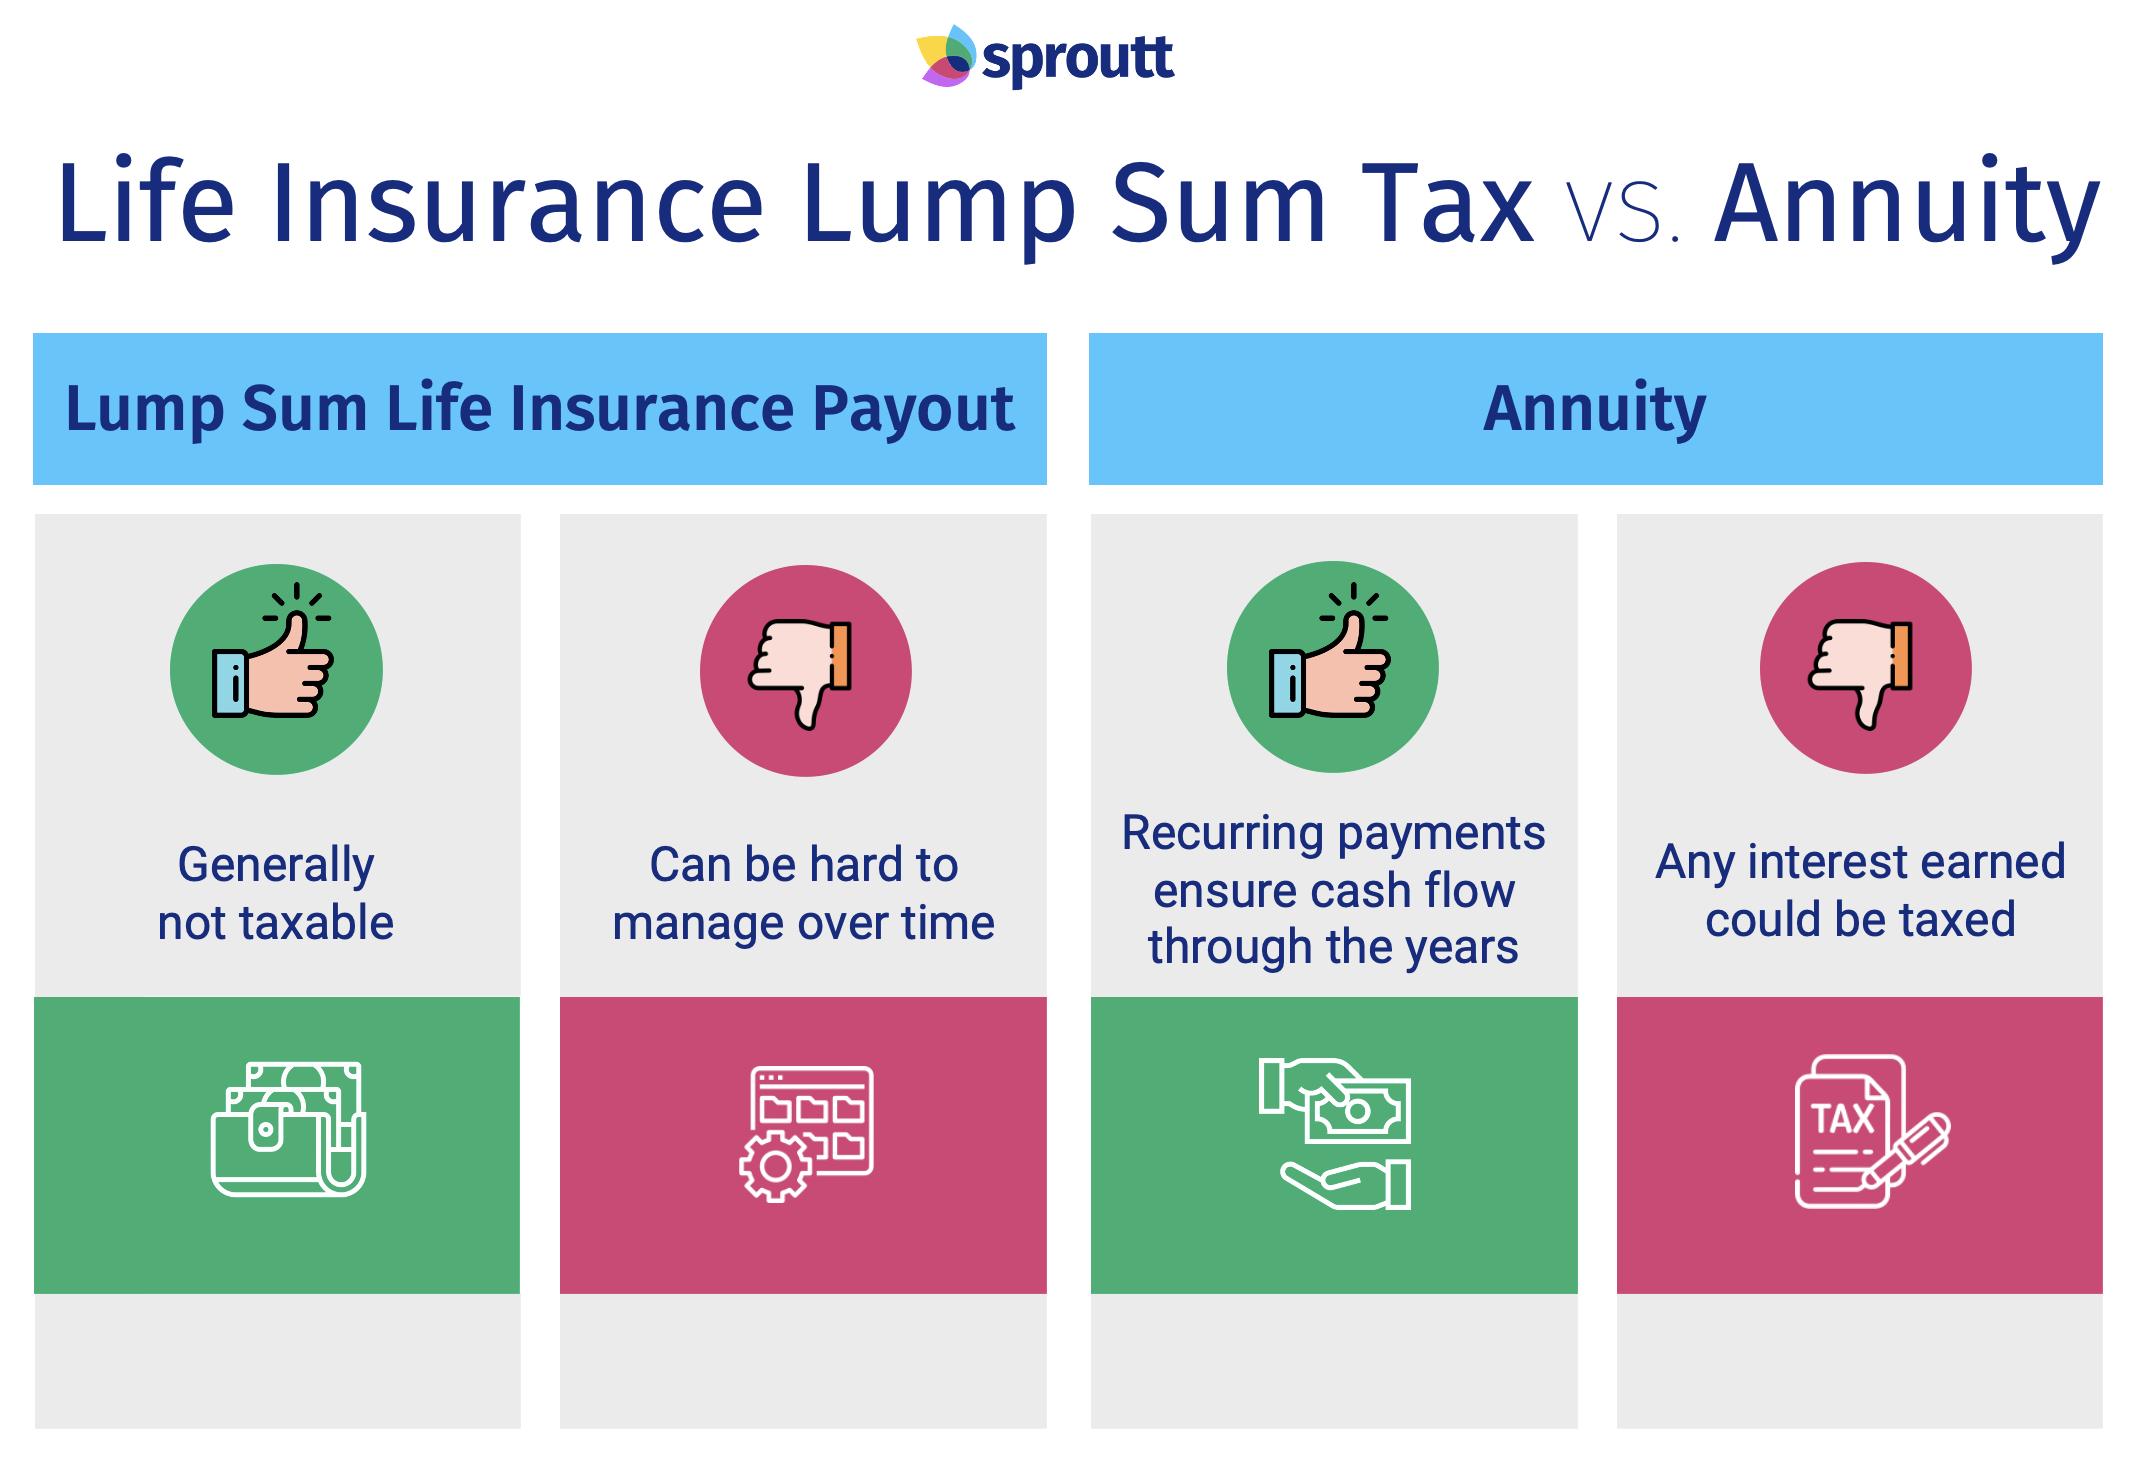 Life Insurance Lump Sum Tax vs. Annuity-Infographic